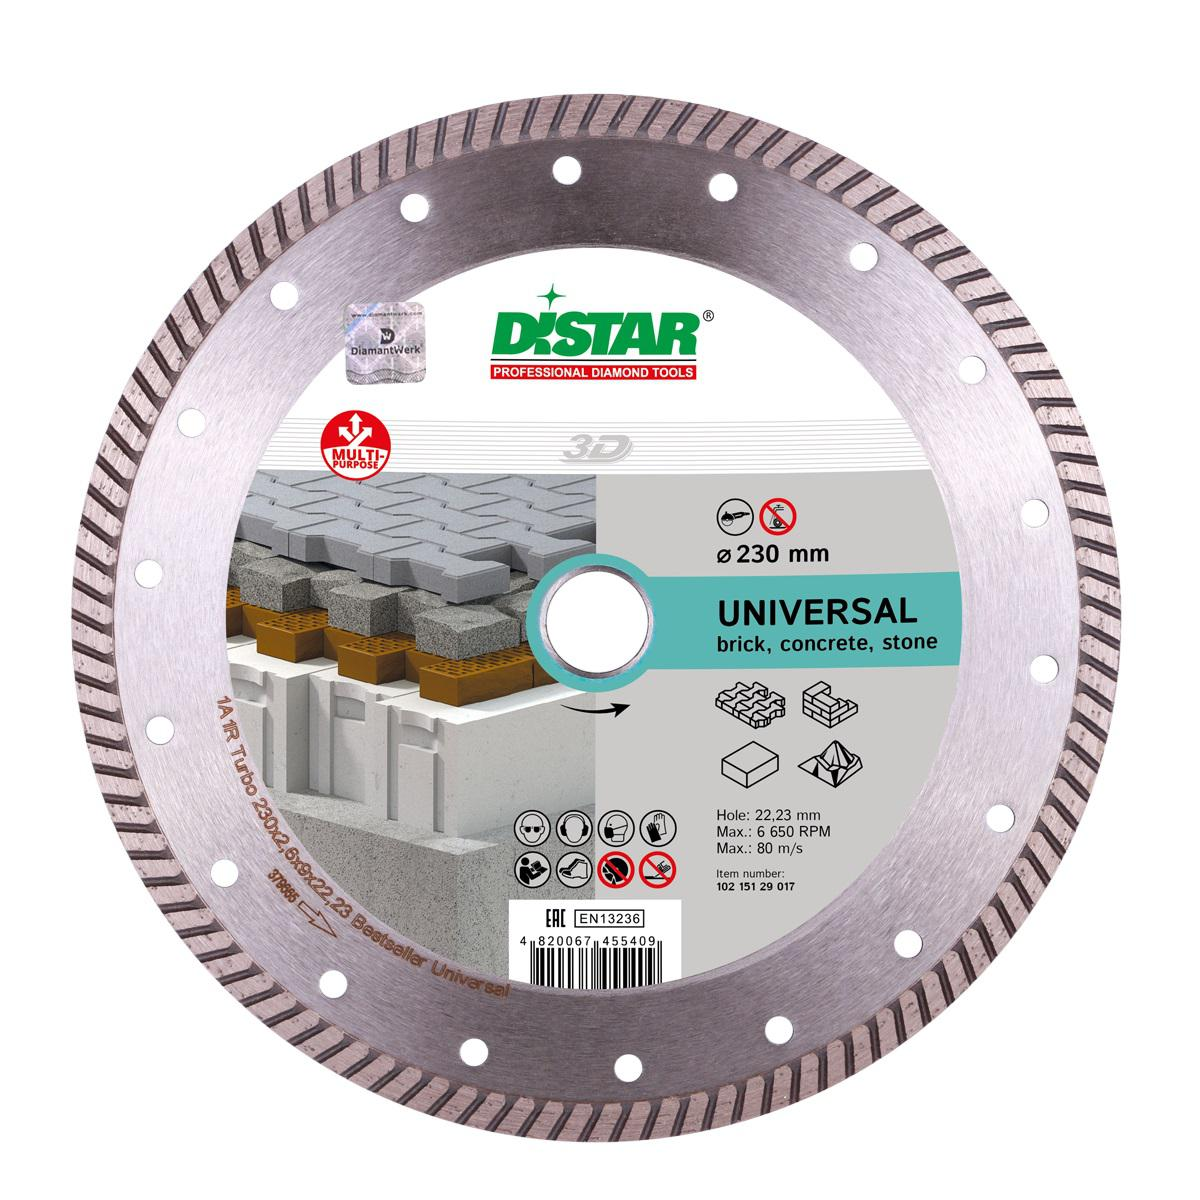 Круг алмазный Distar 1a1r turbo 230x2,6x9x22,23 bestseller universal